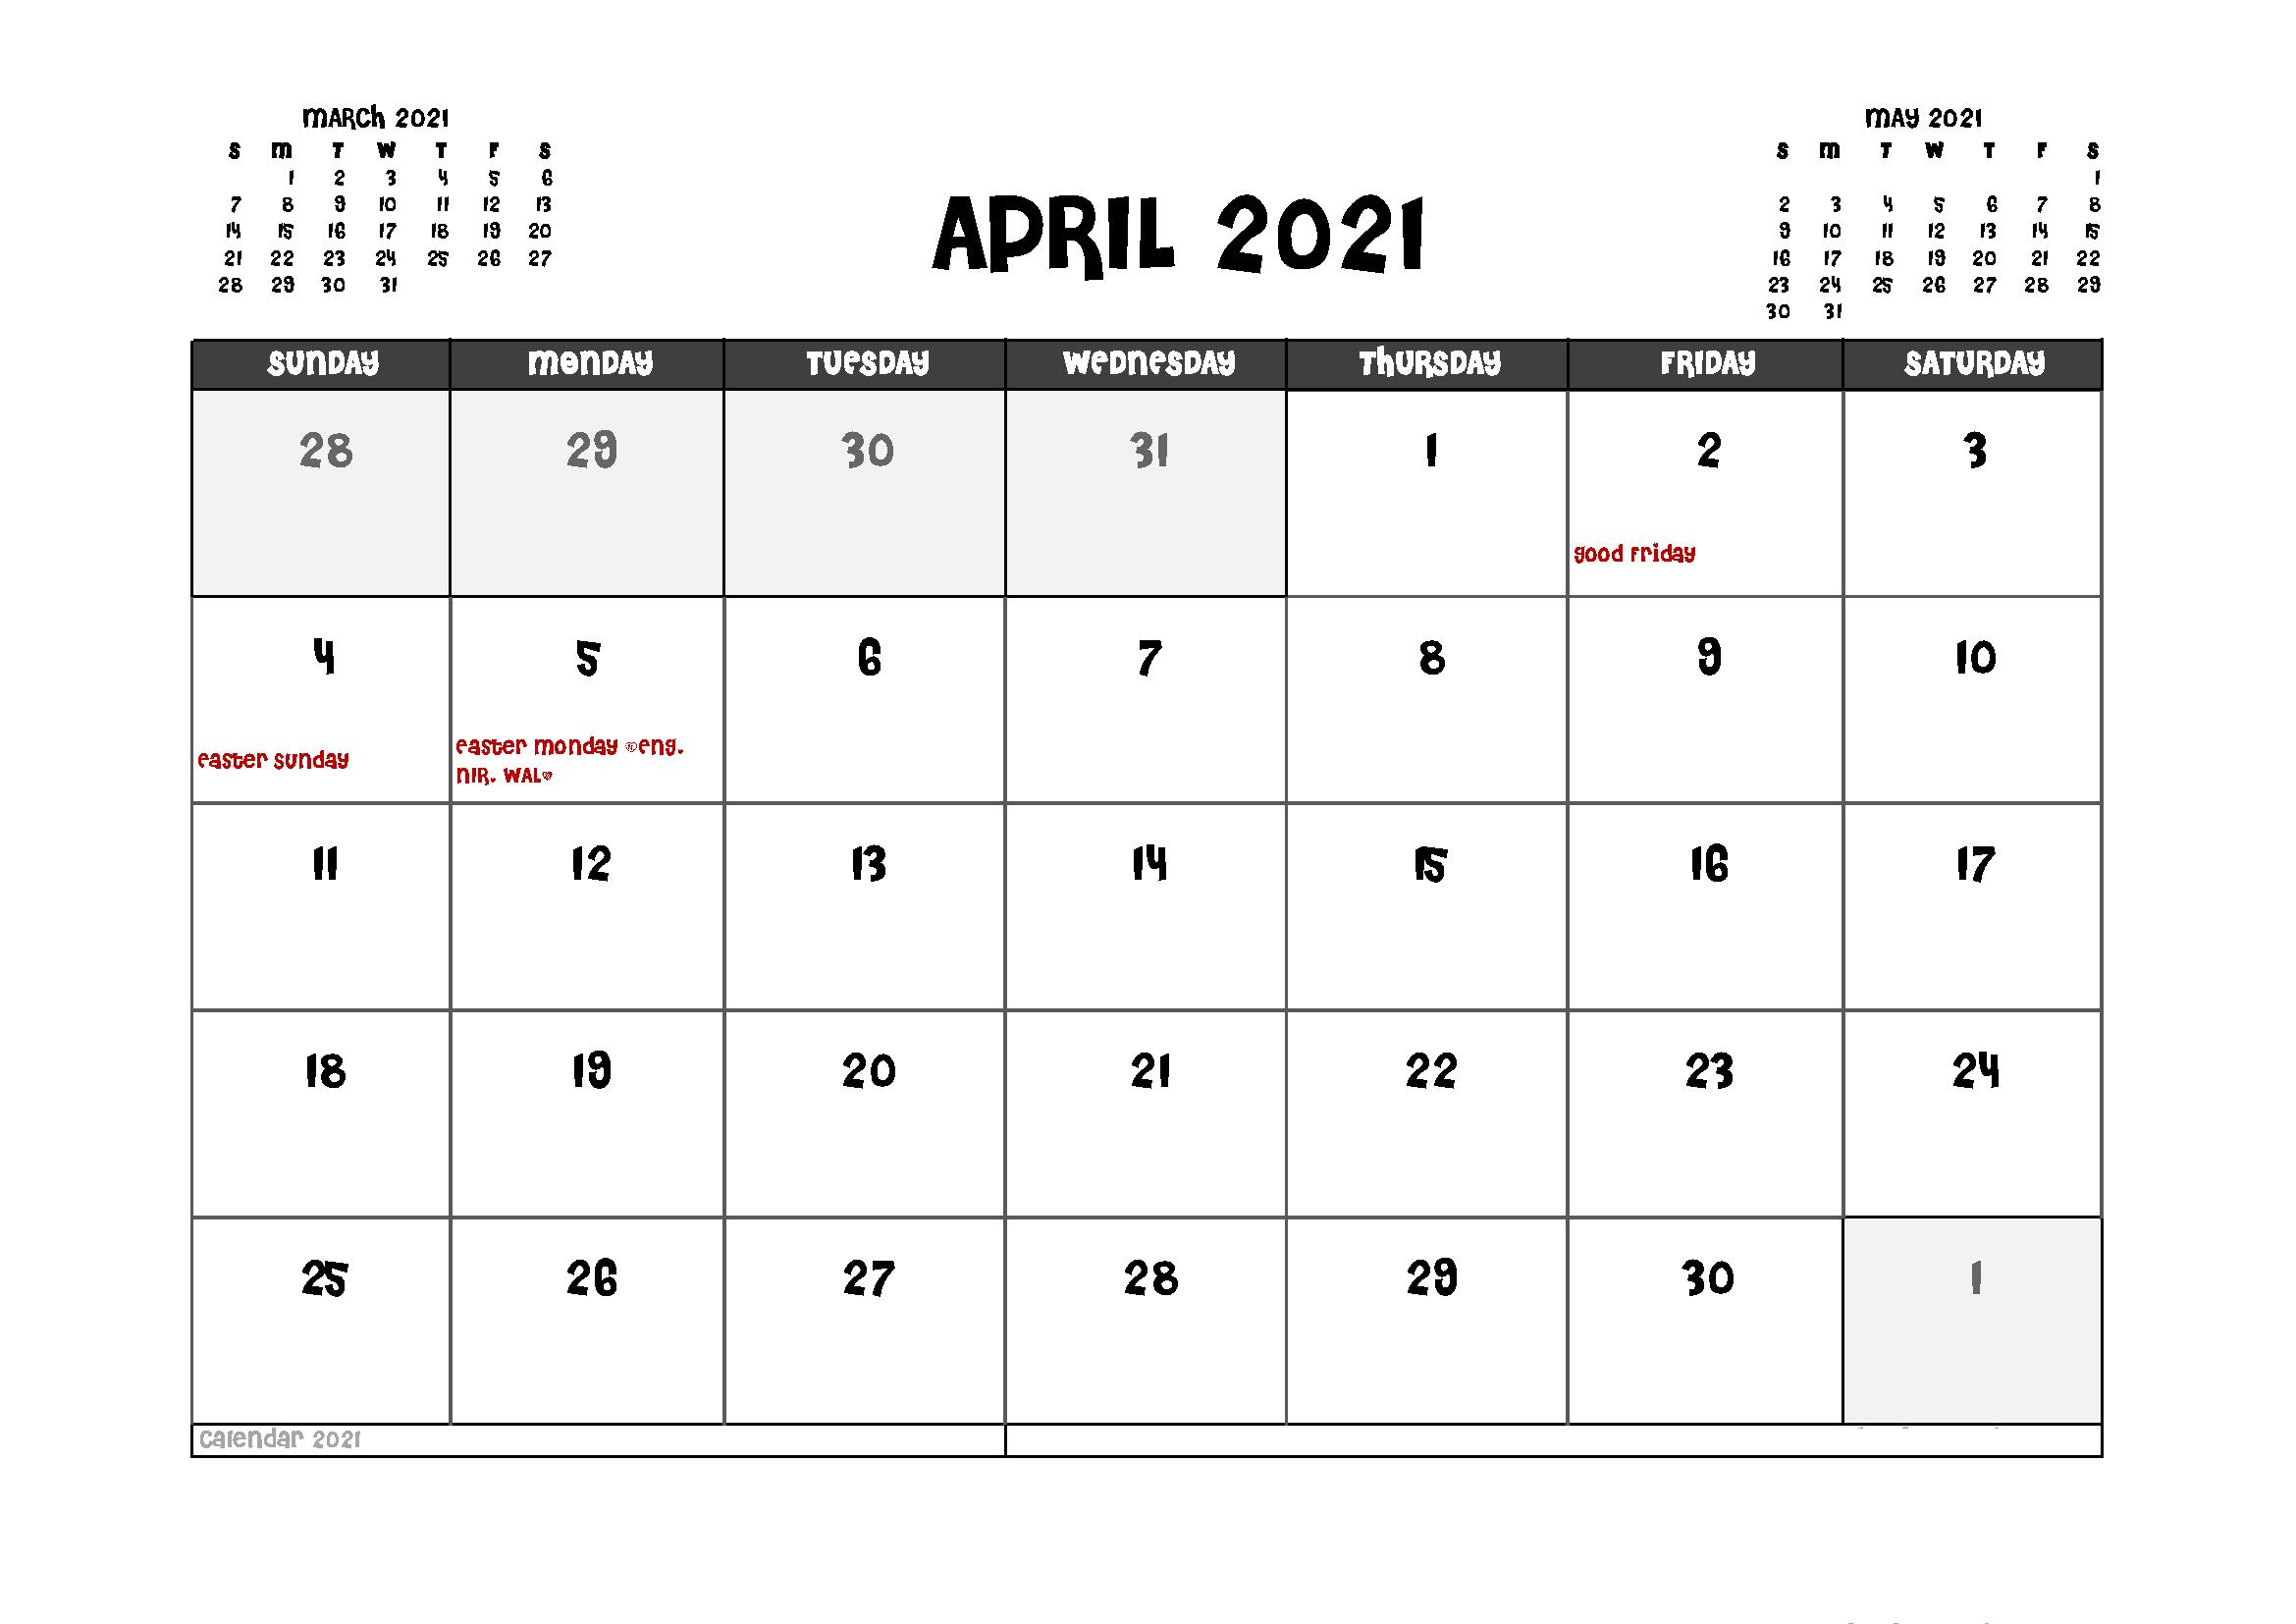 April 2021 Local Holidays Calendar